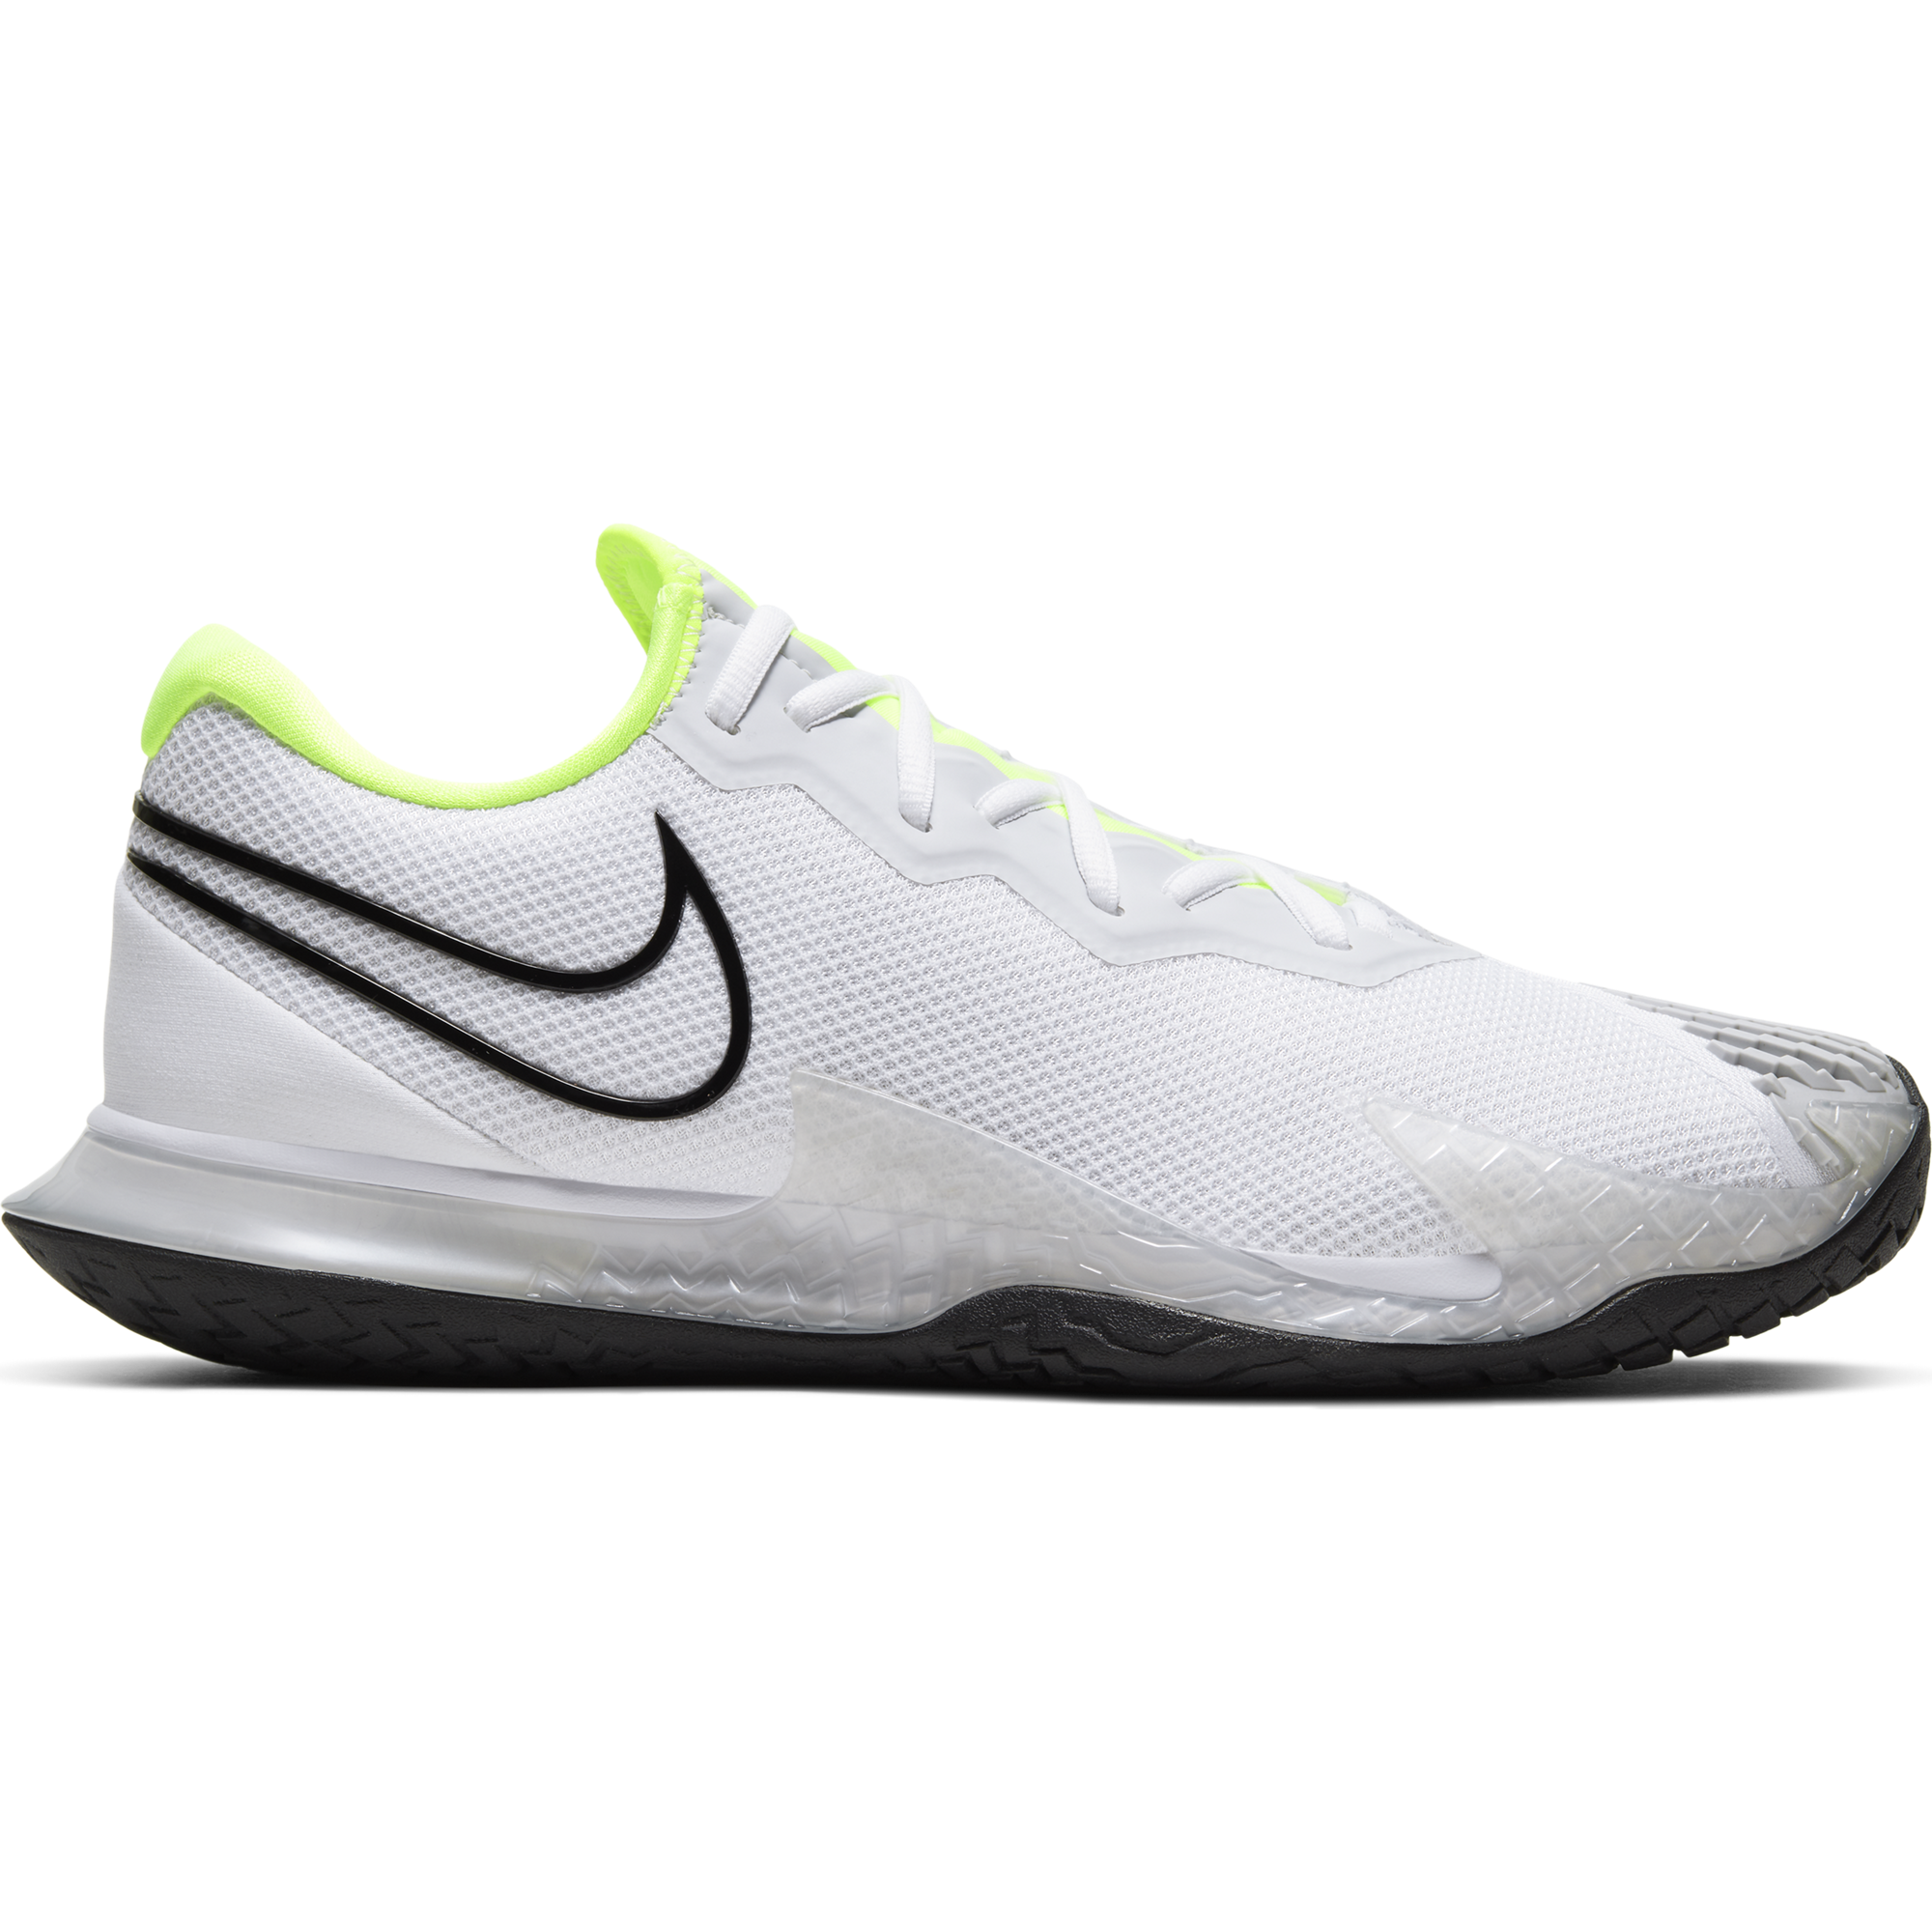 Air Zoom Vapor Cage 4 Men's Tennis Shoe - White/Yellow